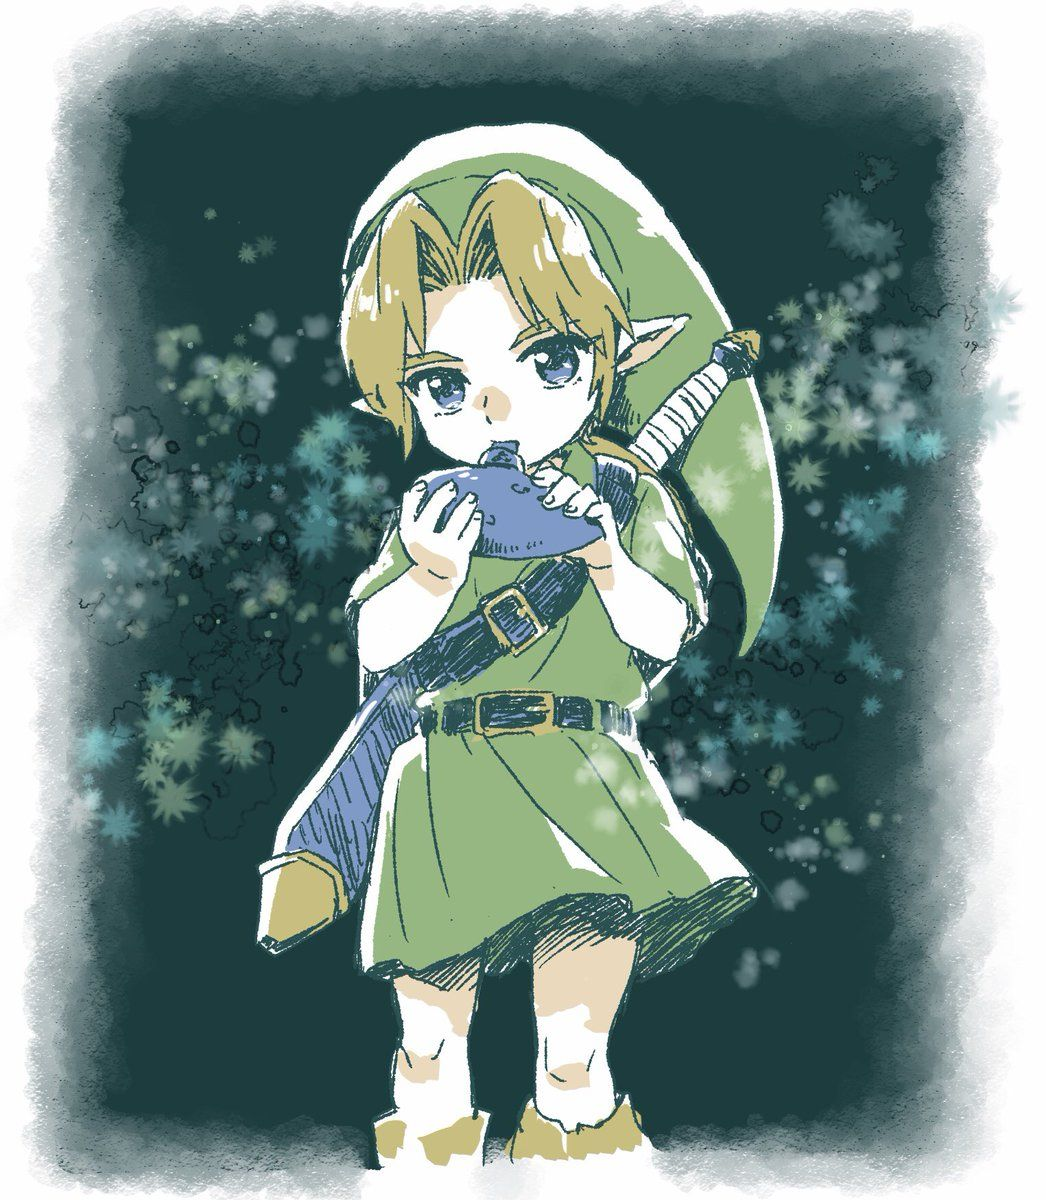 Asama Asariyosi Ocarina Of Time Legend Of Zelda Breath Link Art